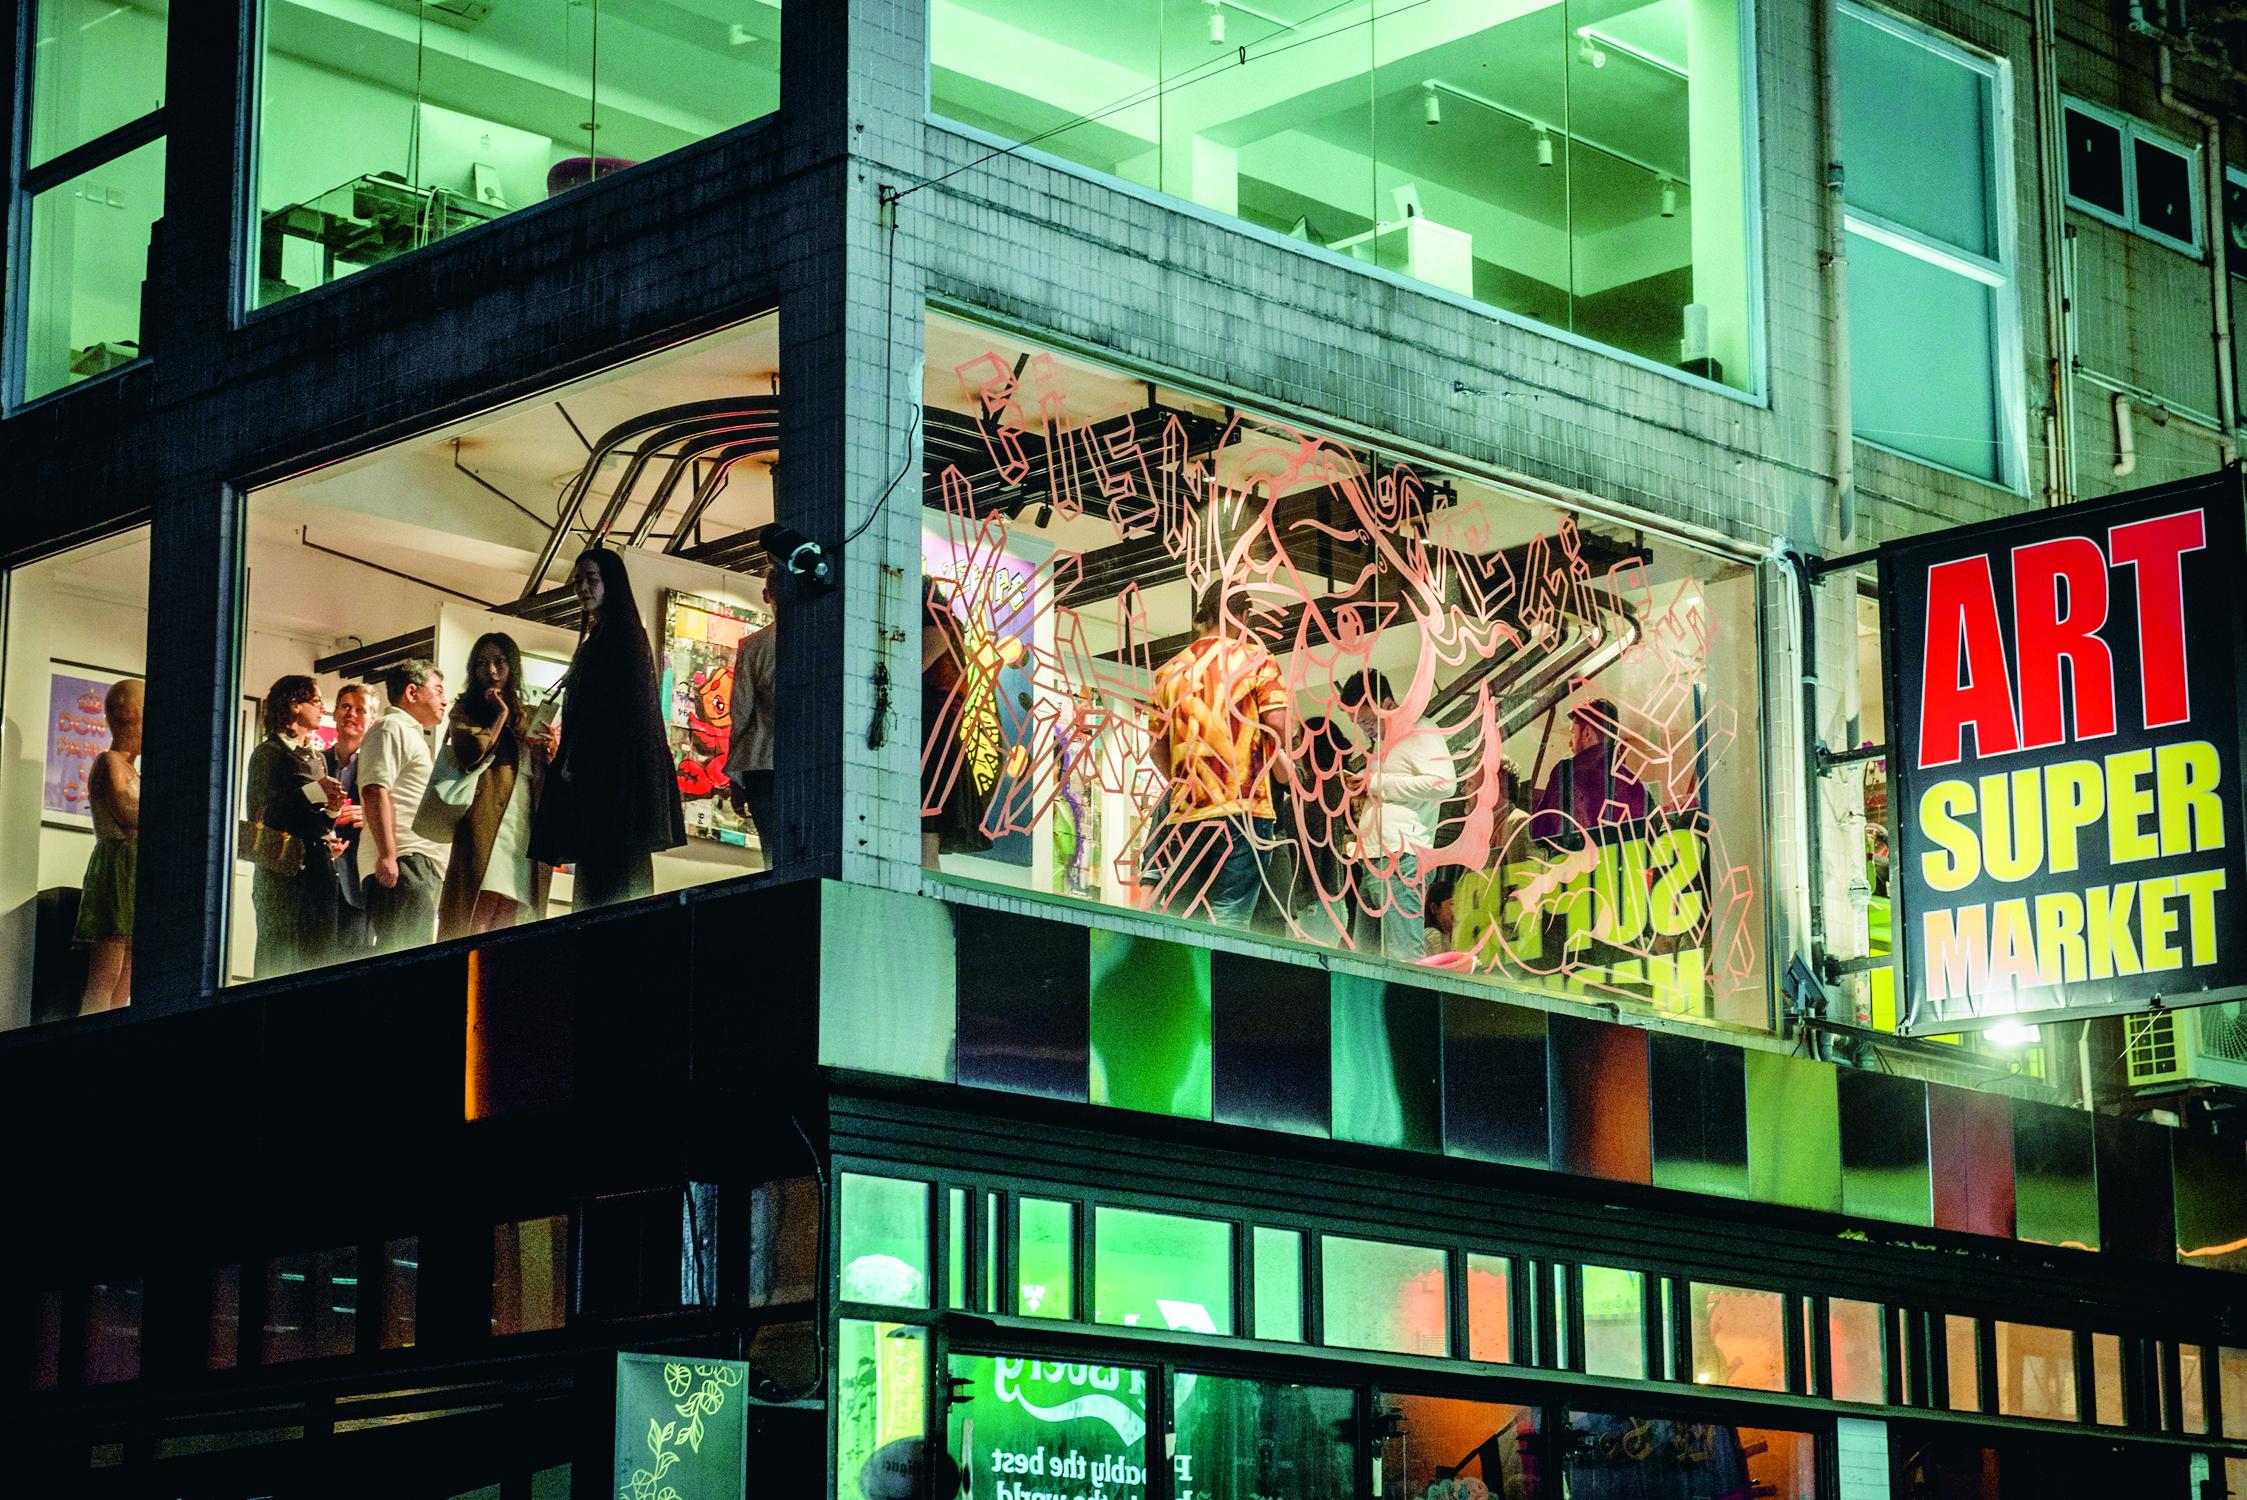 Art Supermarket exterior